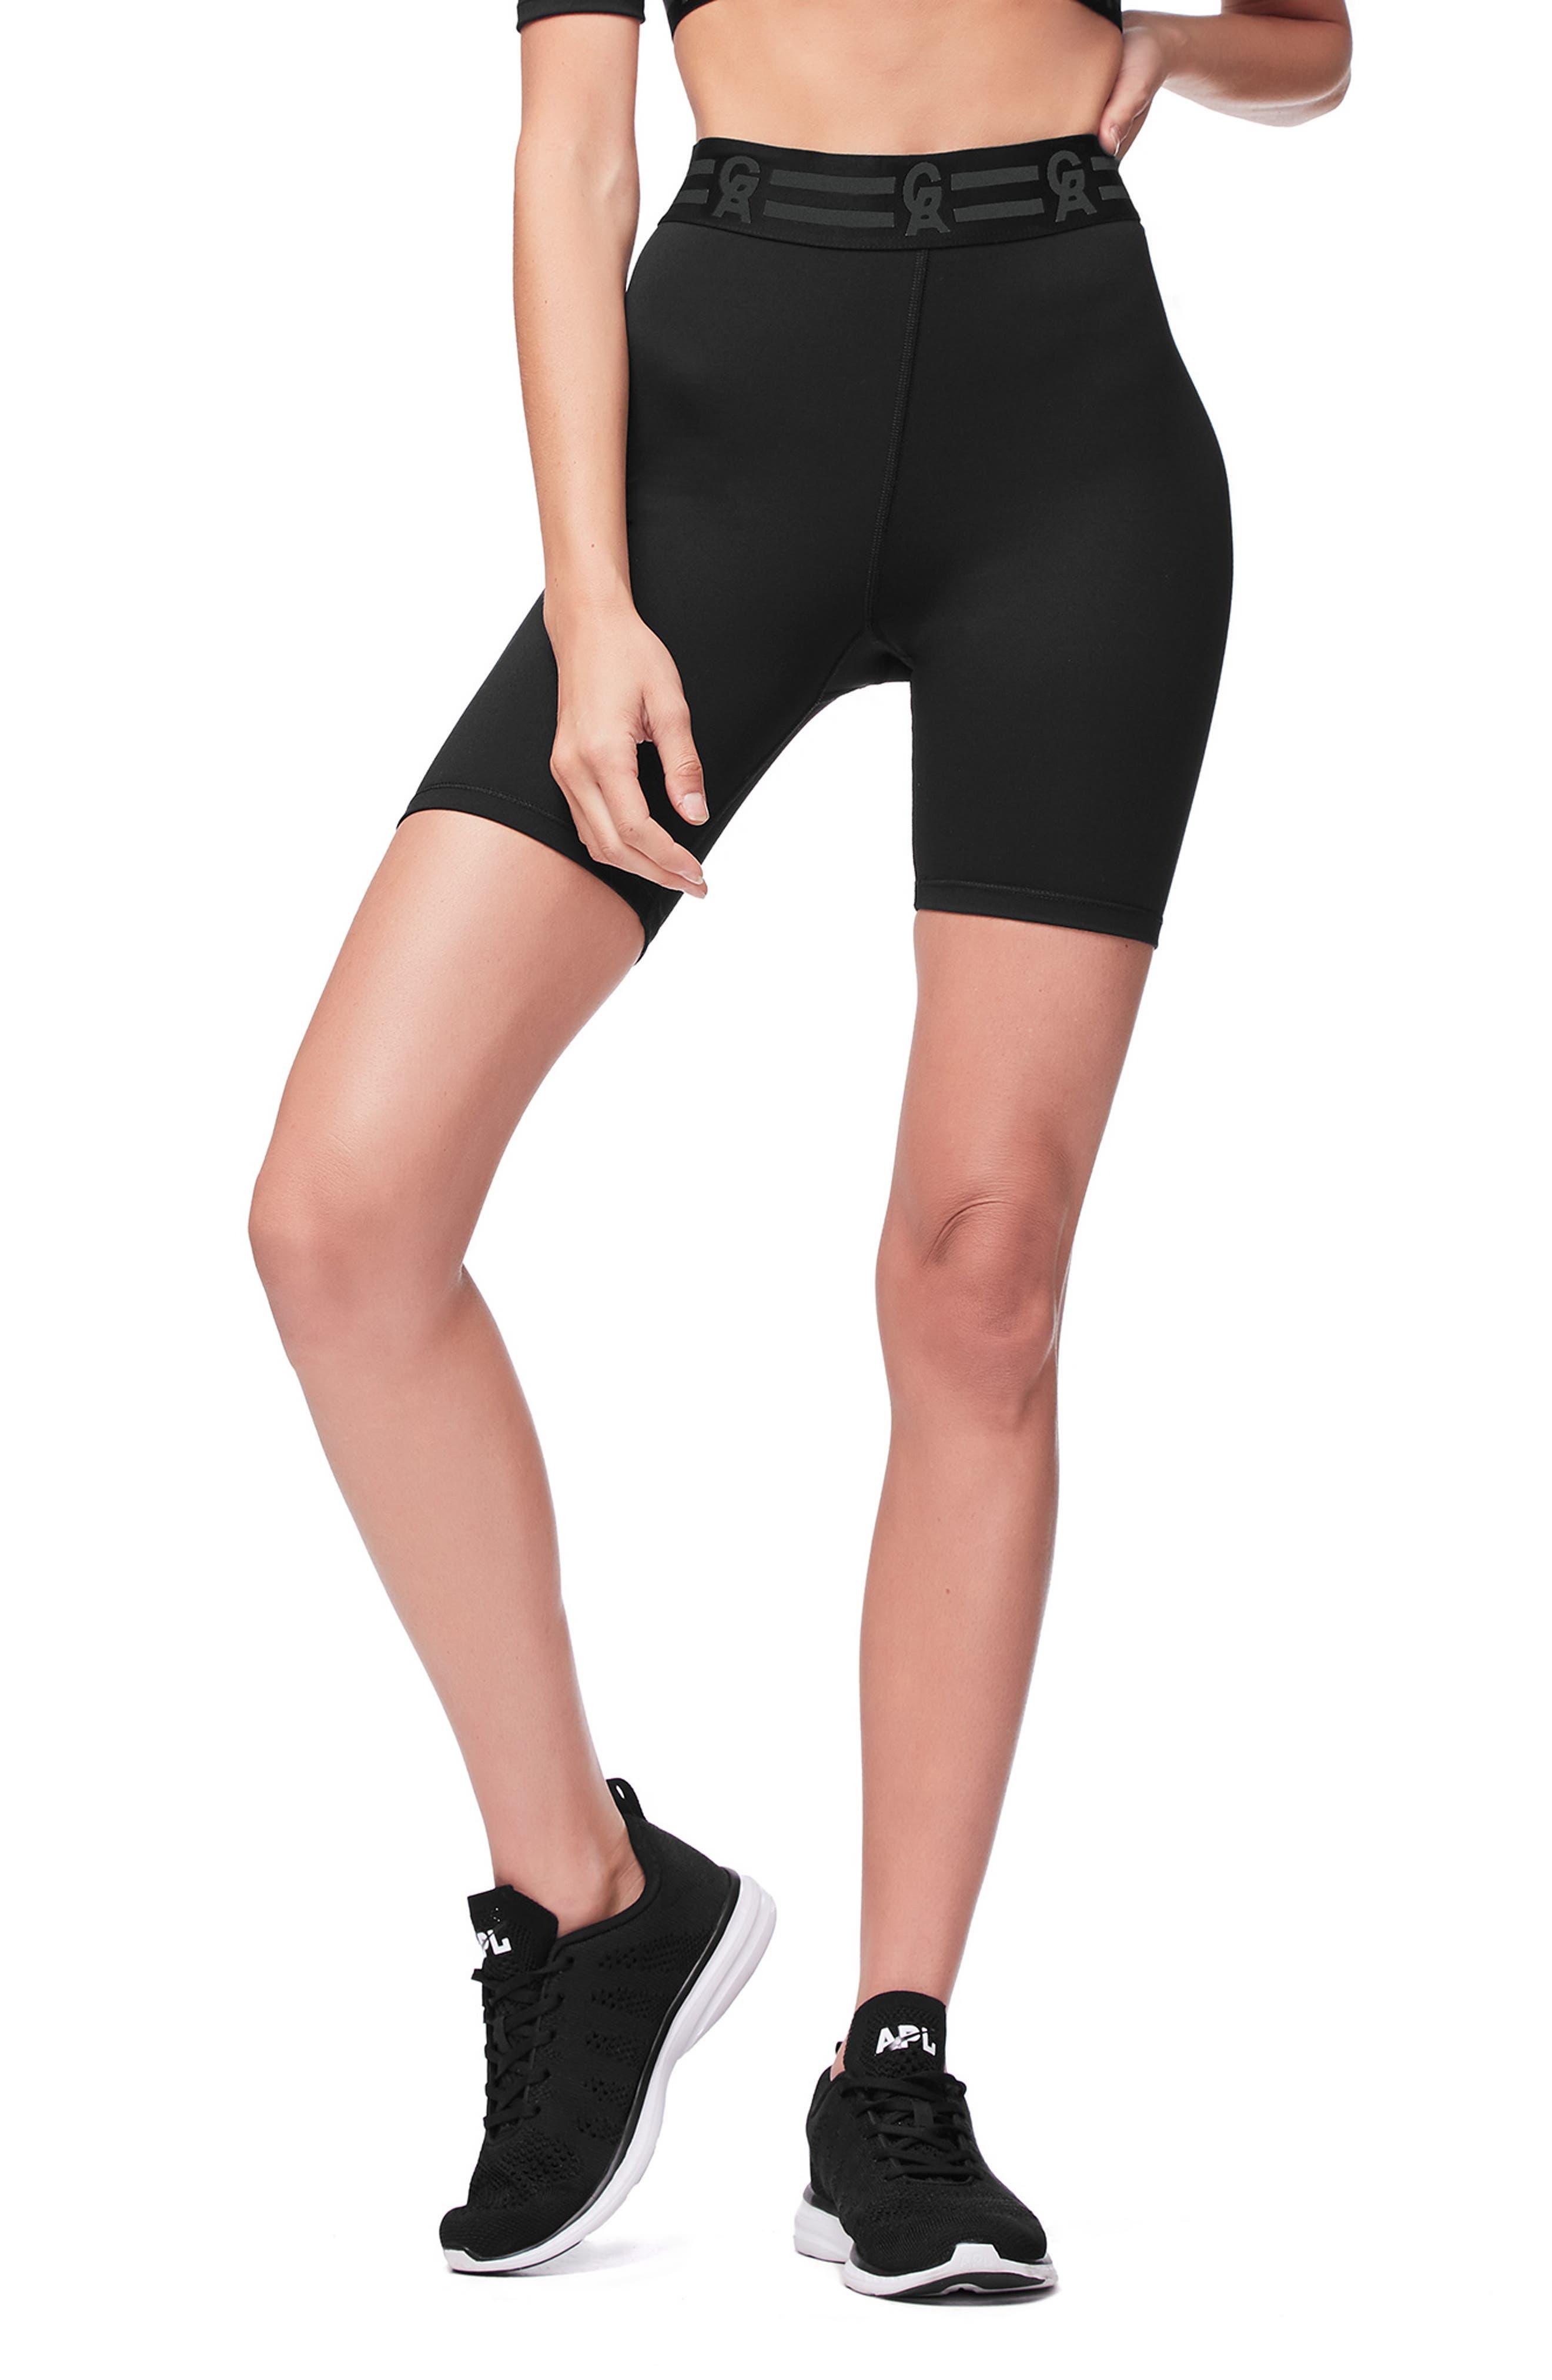 Icon High Waist Biker Shorts,                         Main,                         color, BLACK001